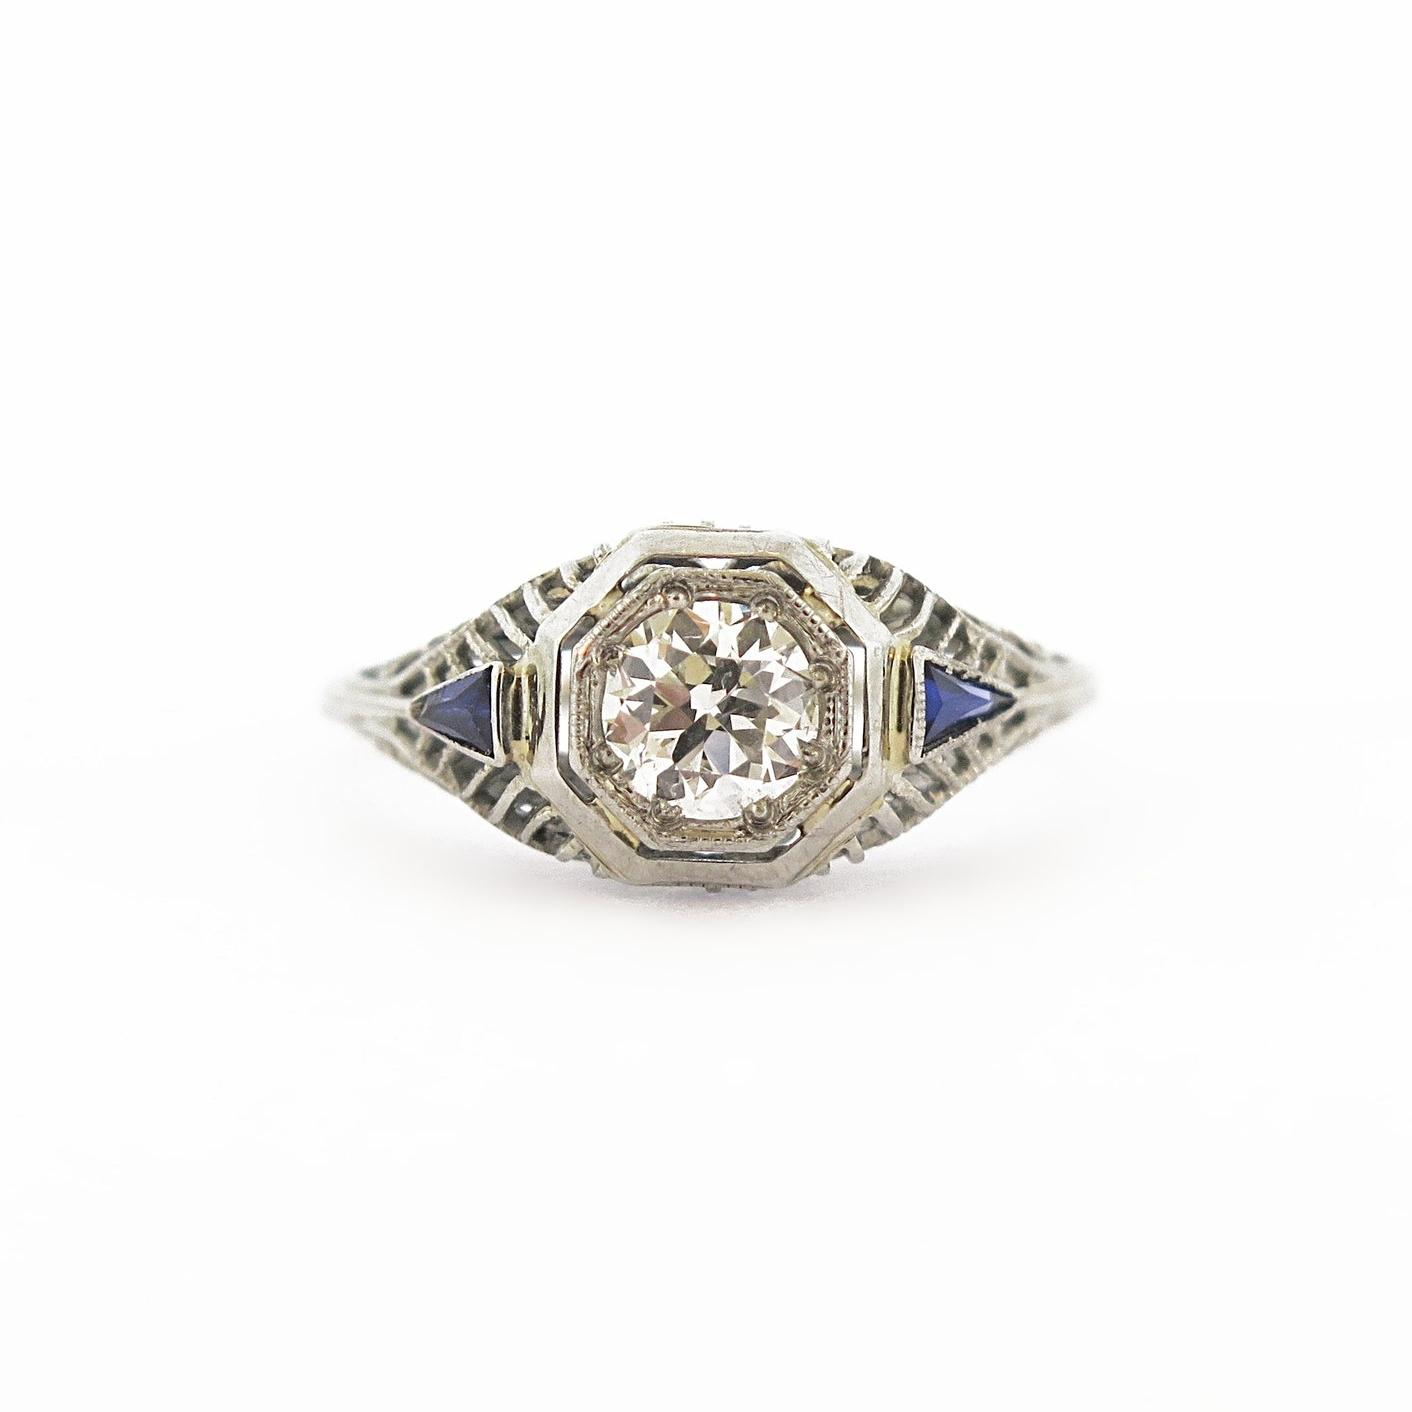 Deco Octagonal Diamond & Sapphire Ring